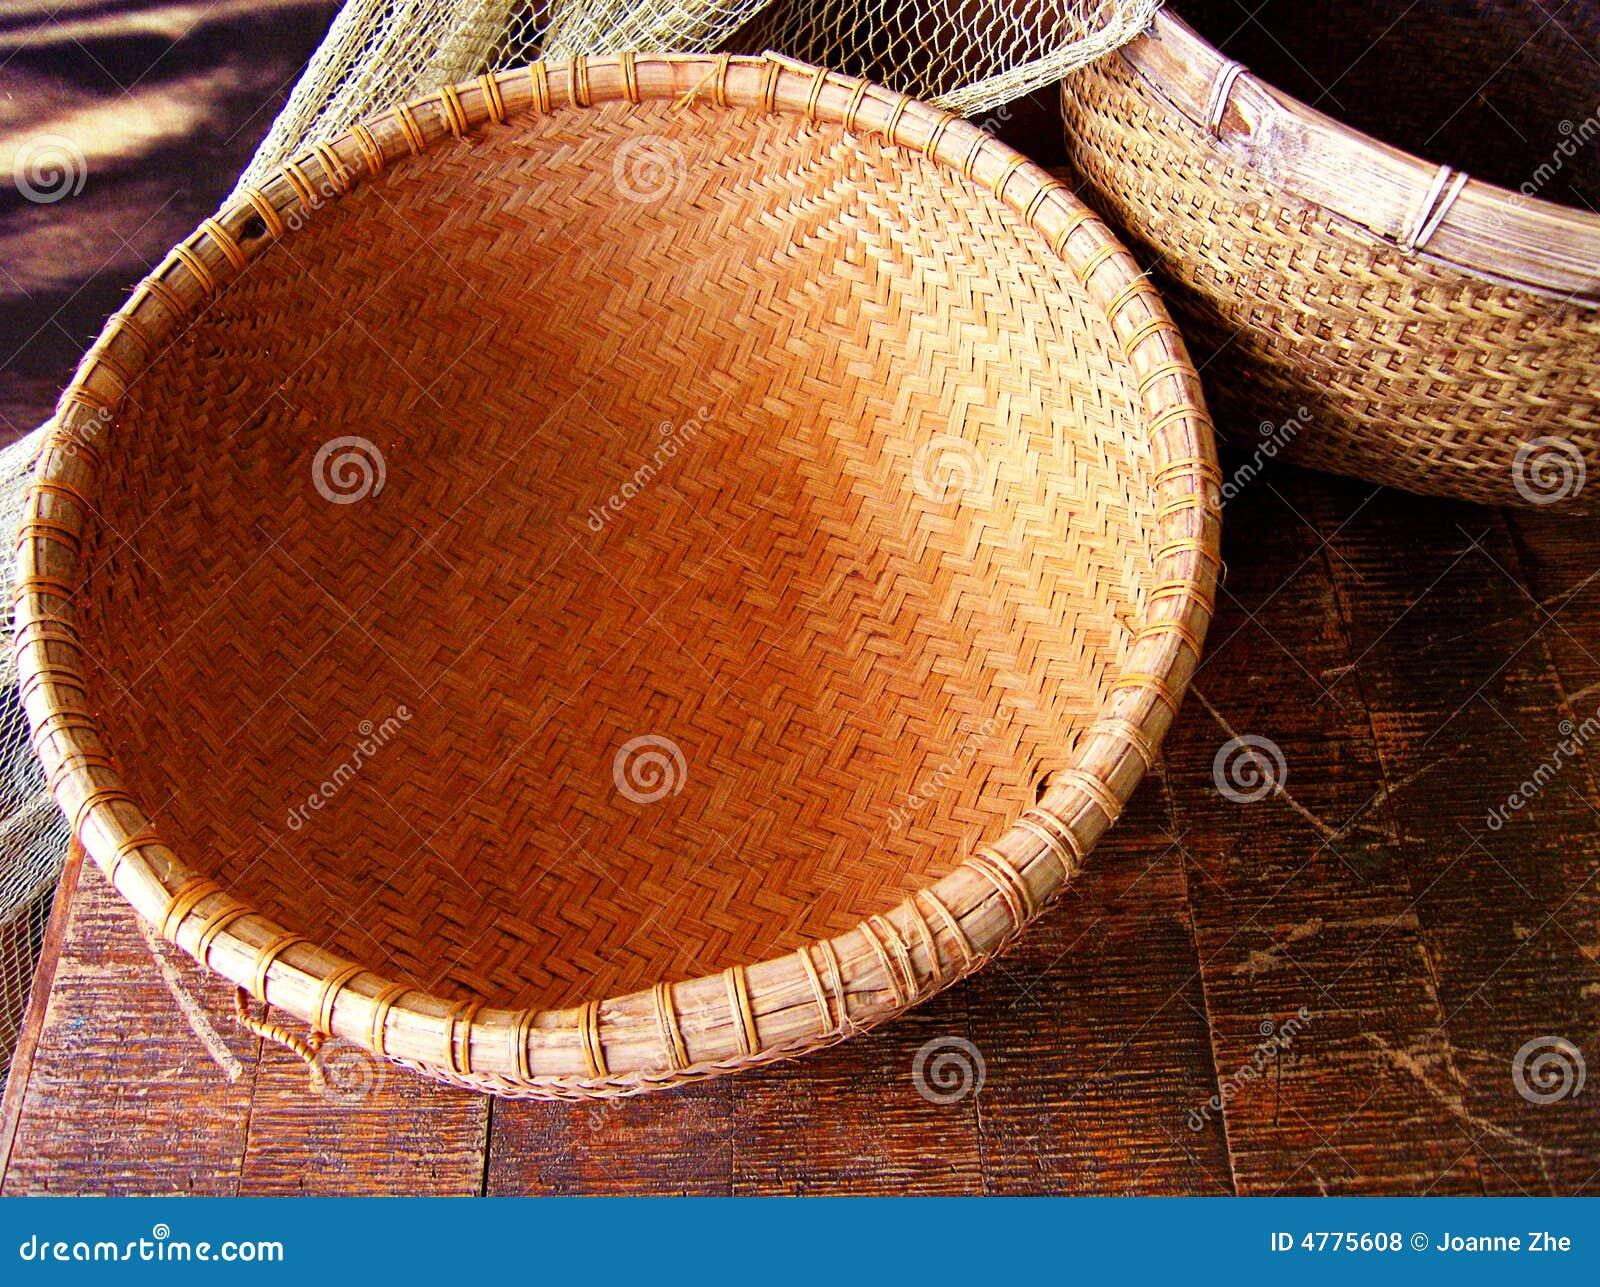 Rattan basket and fishing net